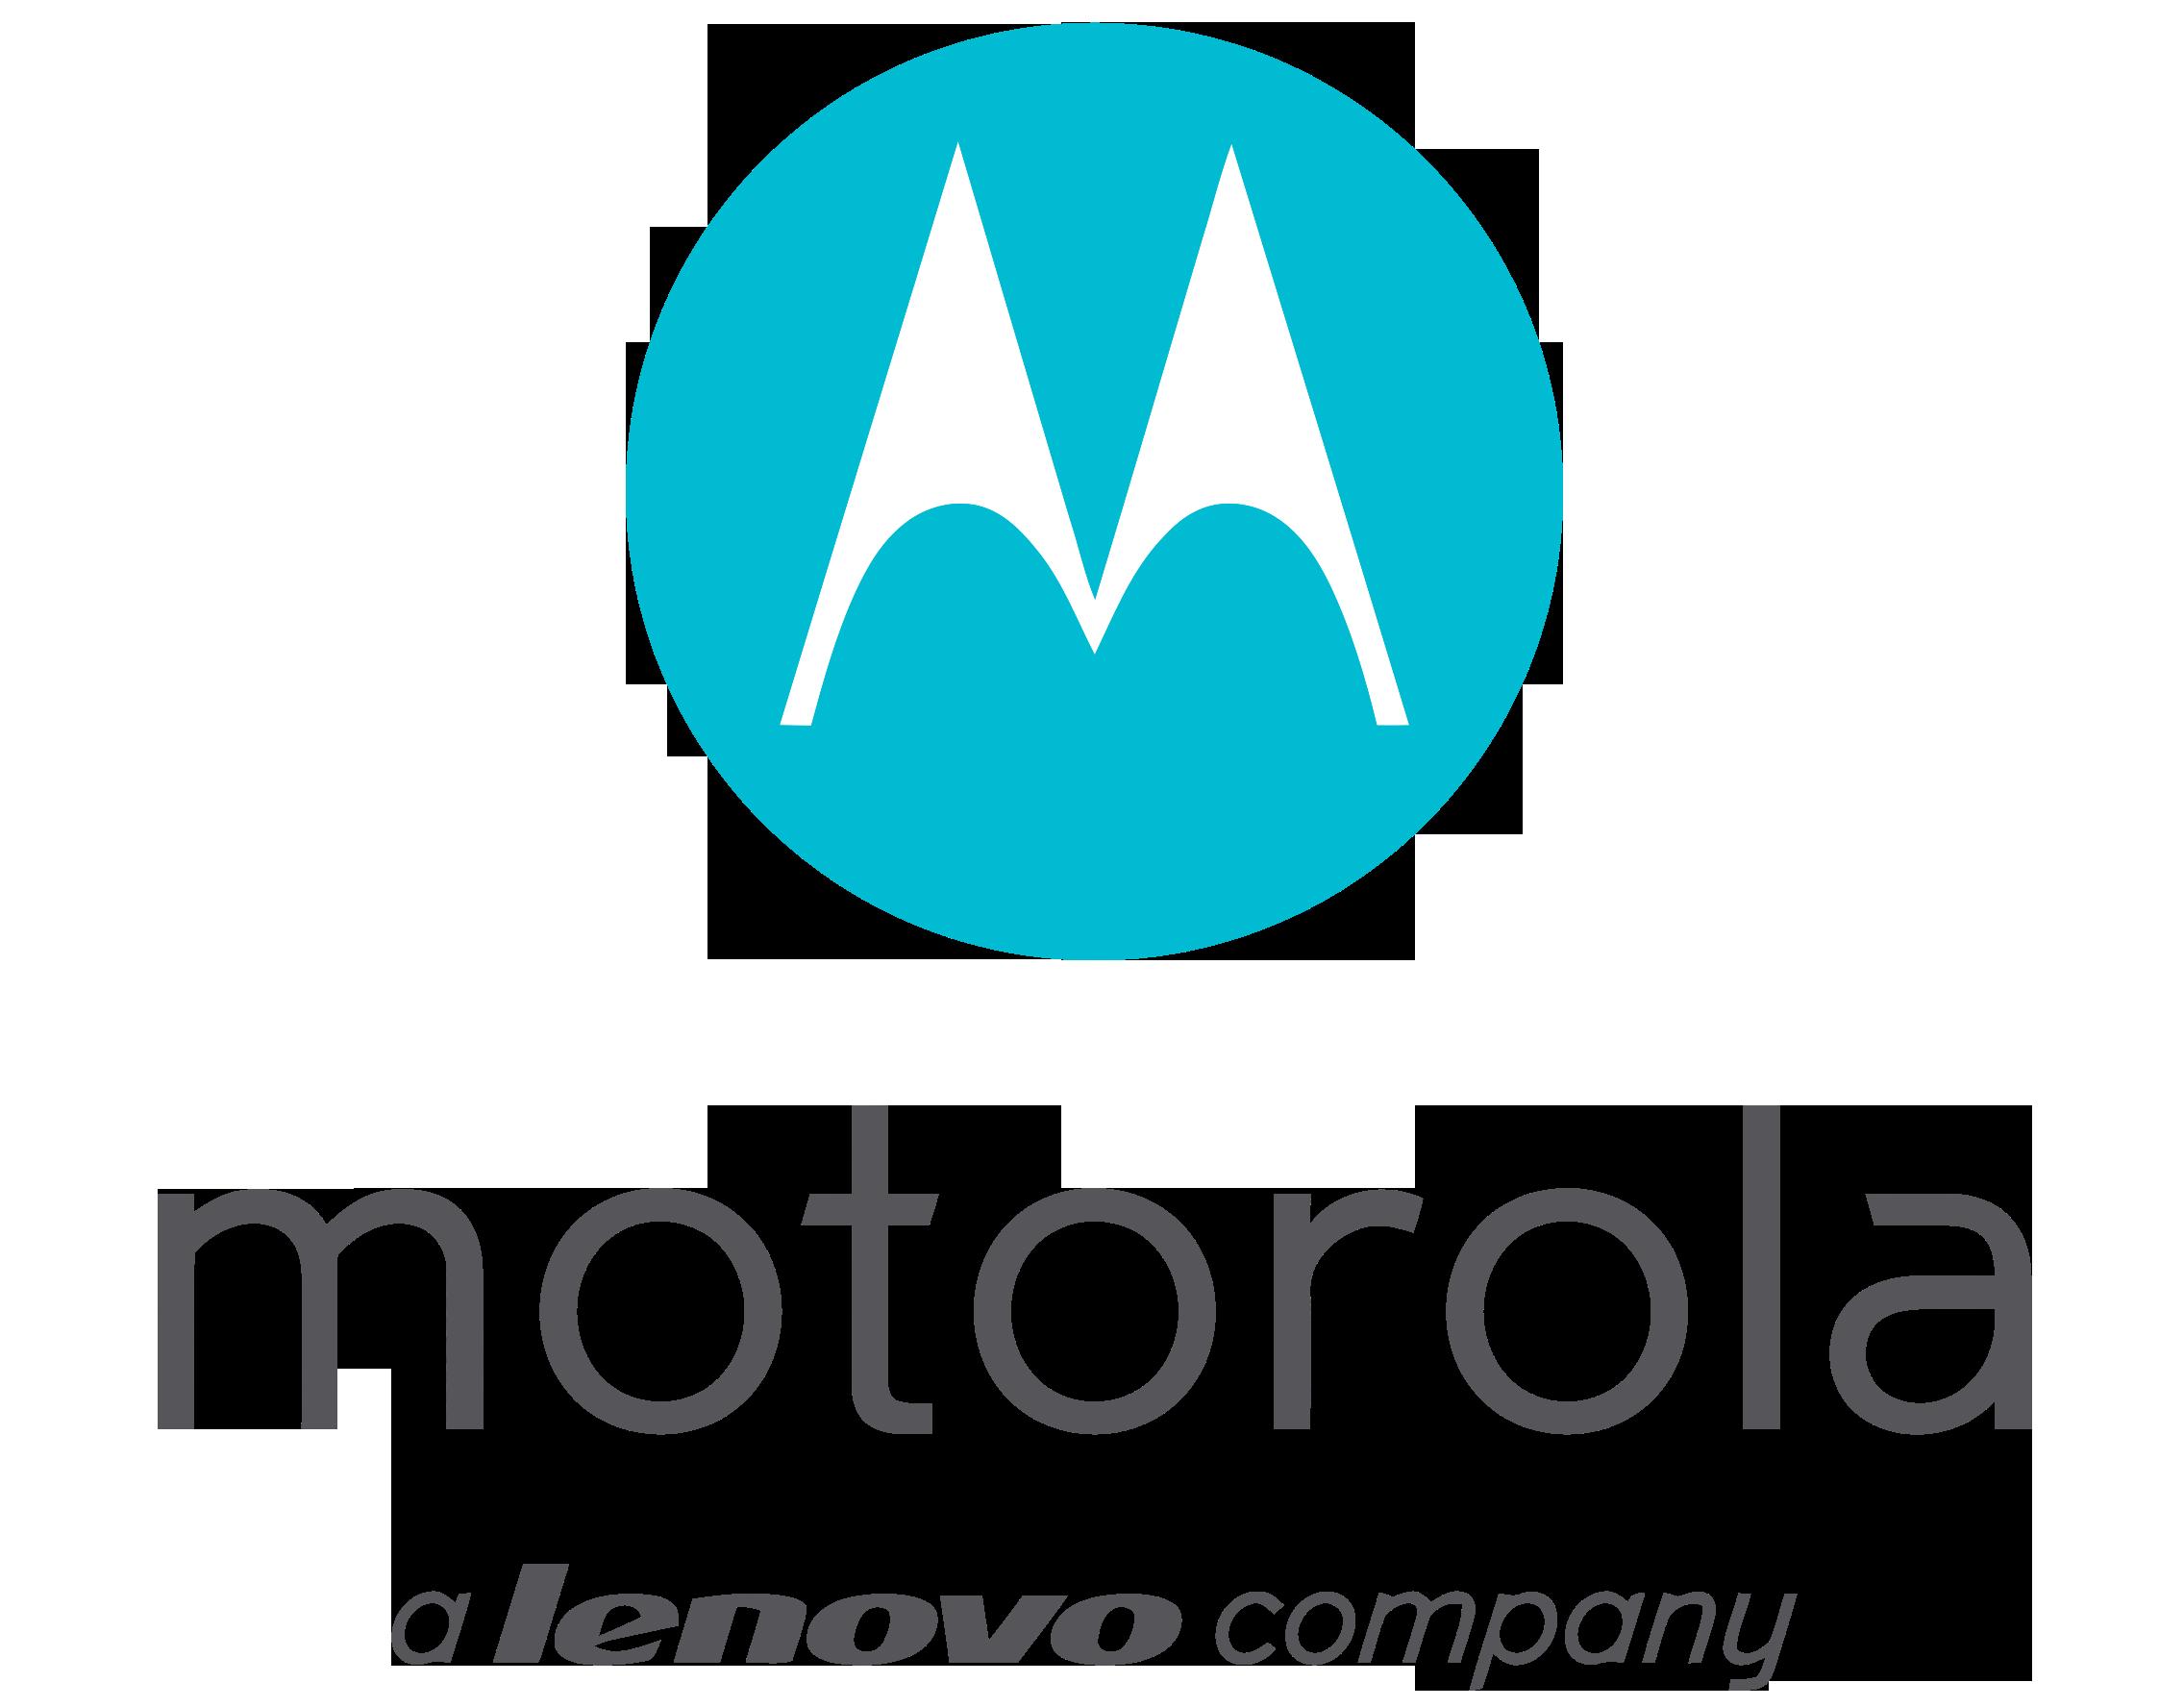 Motorola_Logo-Lenovo-Company.png